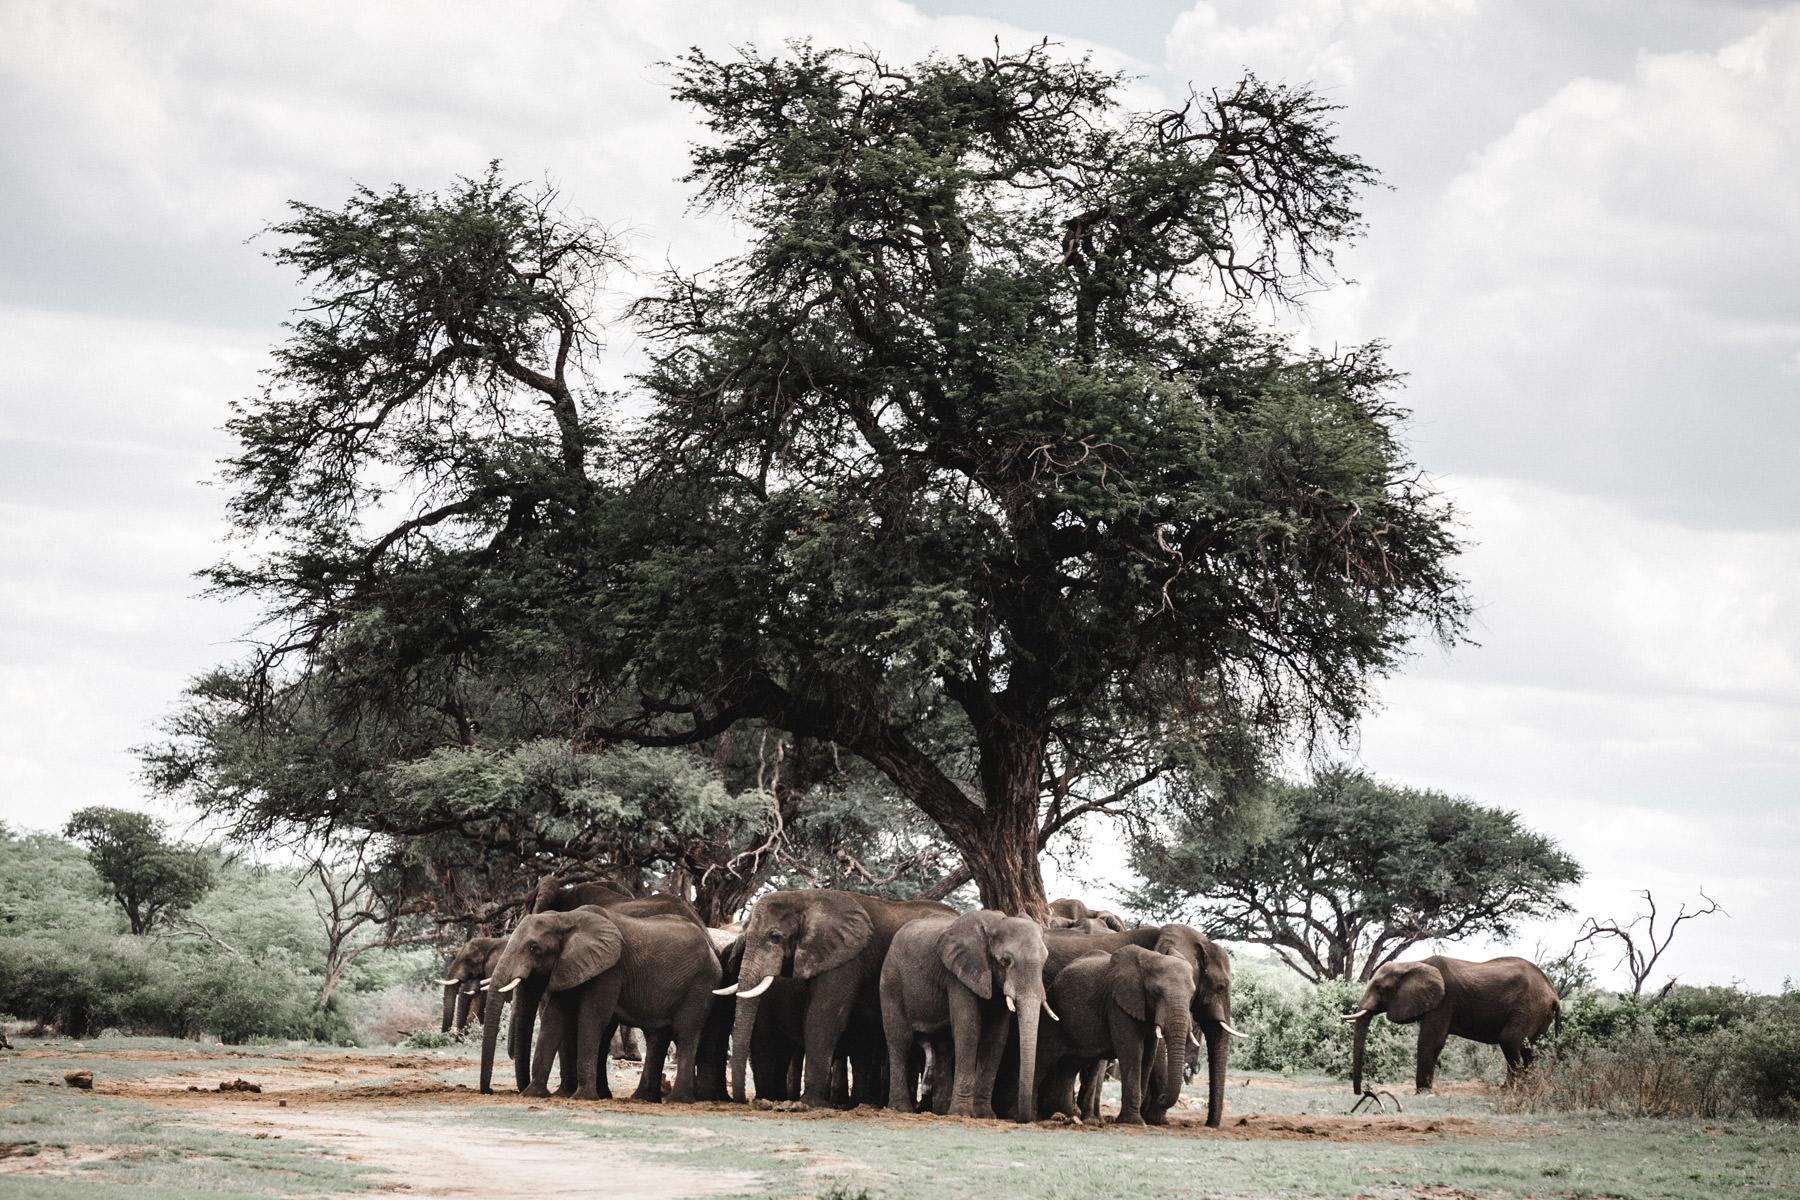 namibia-elephant-herrd-under-a-tree